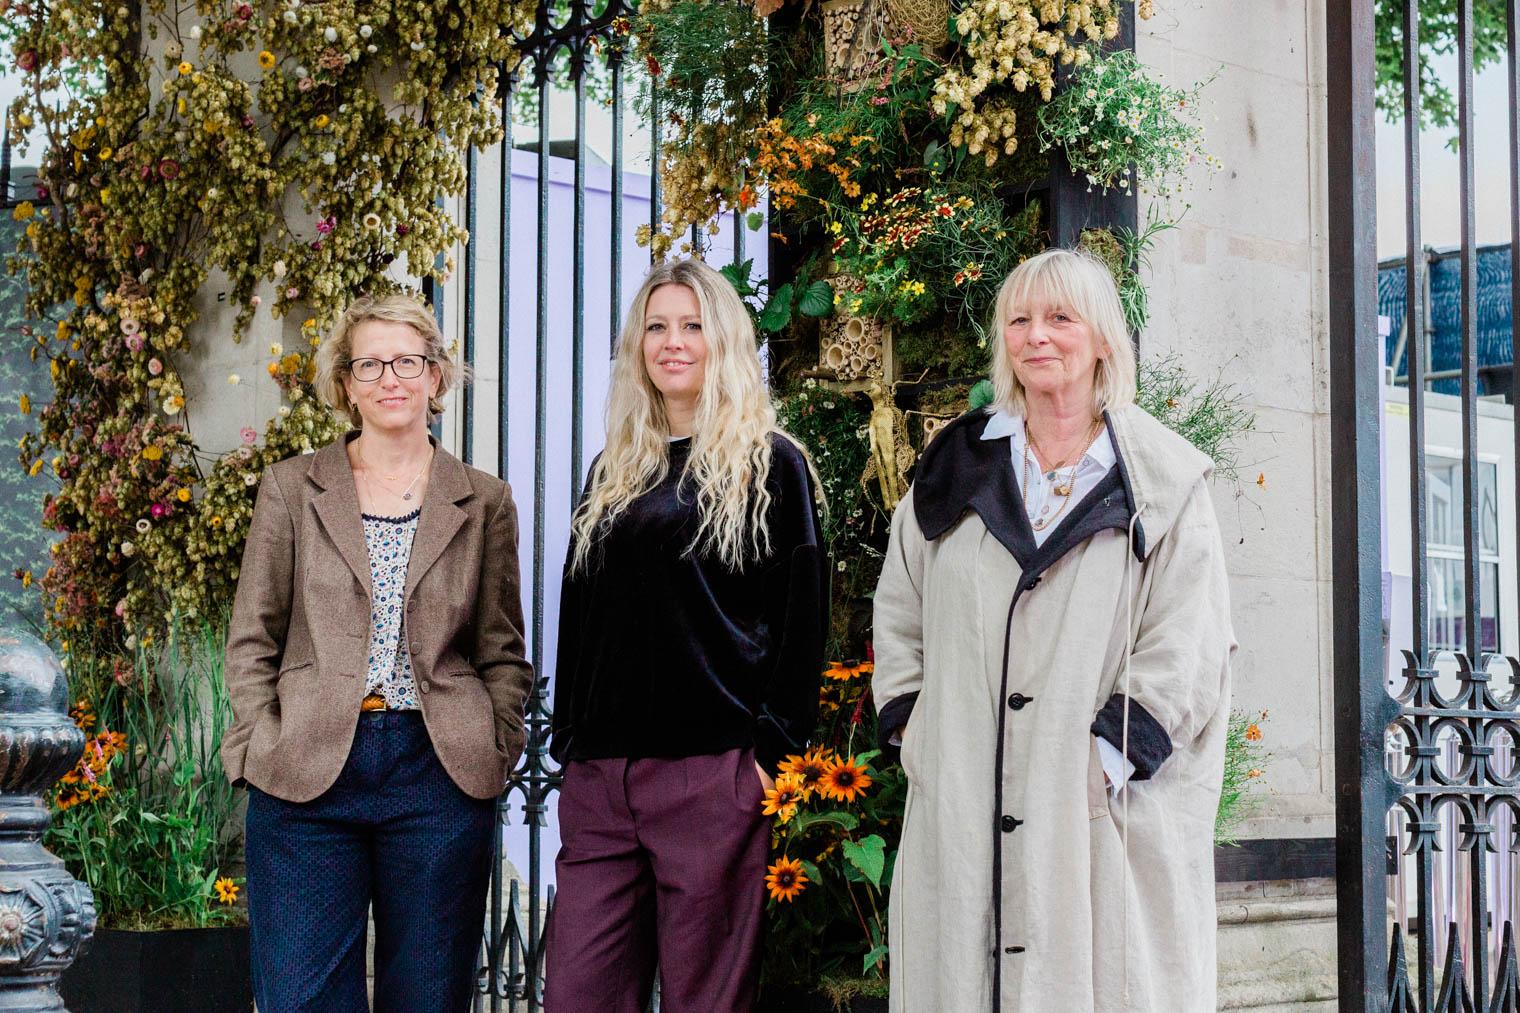 Daisy Garnett together with Talena Rolfe and Melissa Richardson from JamJar Flowers